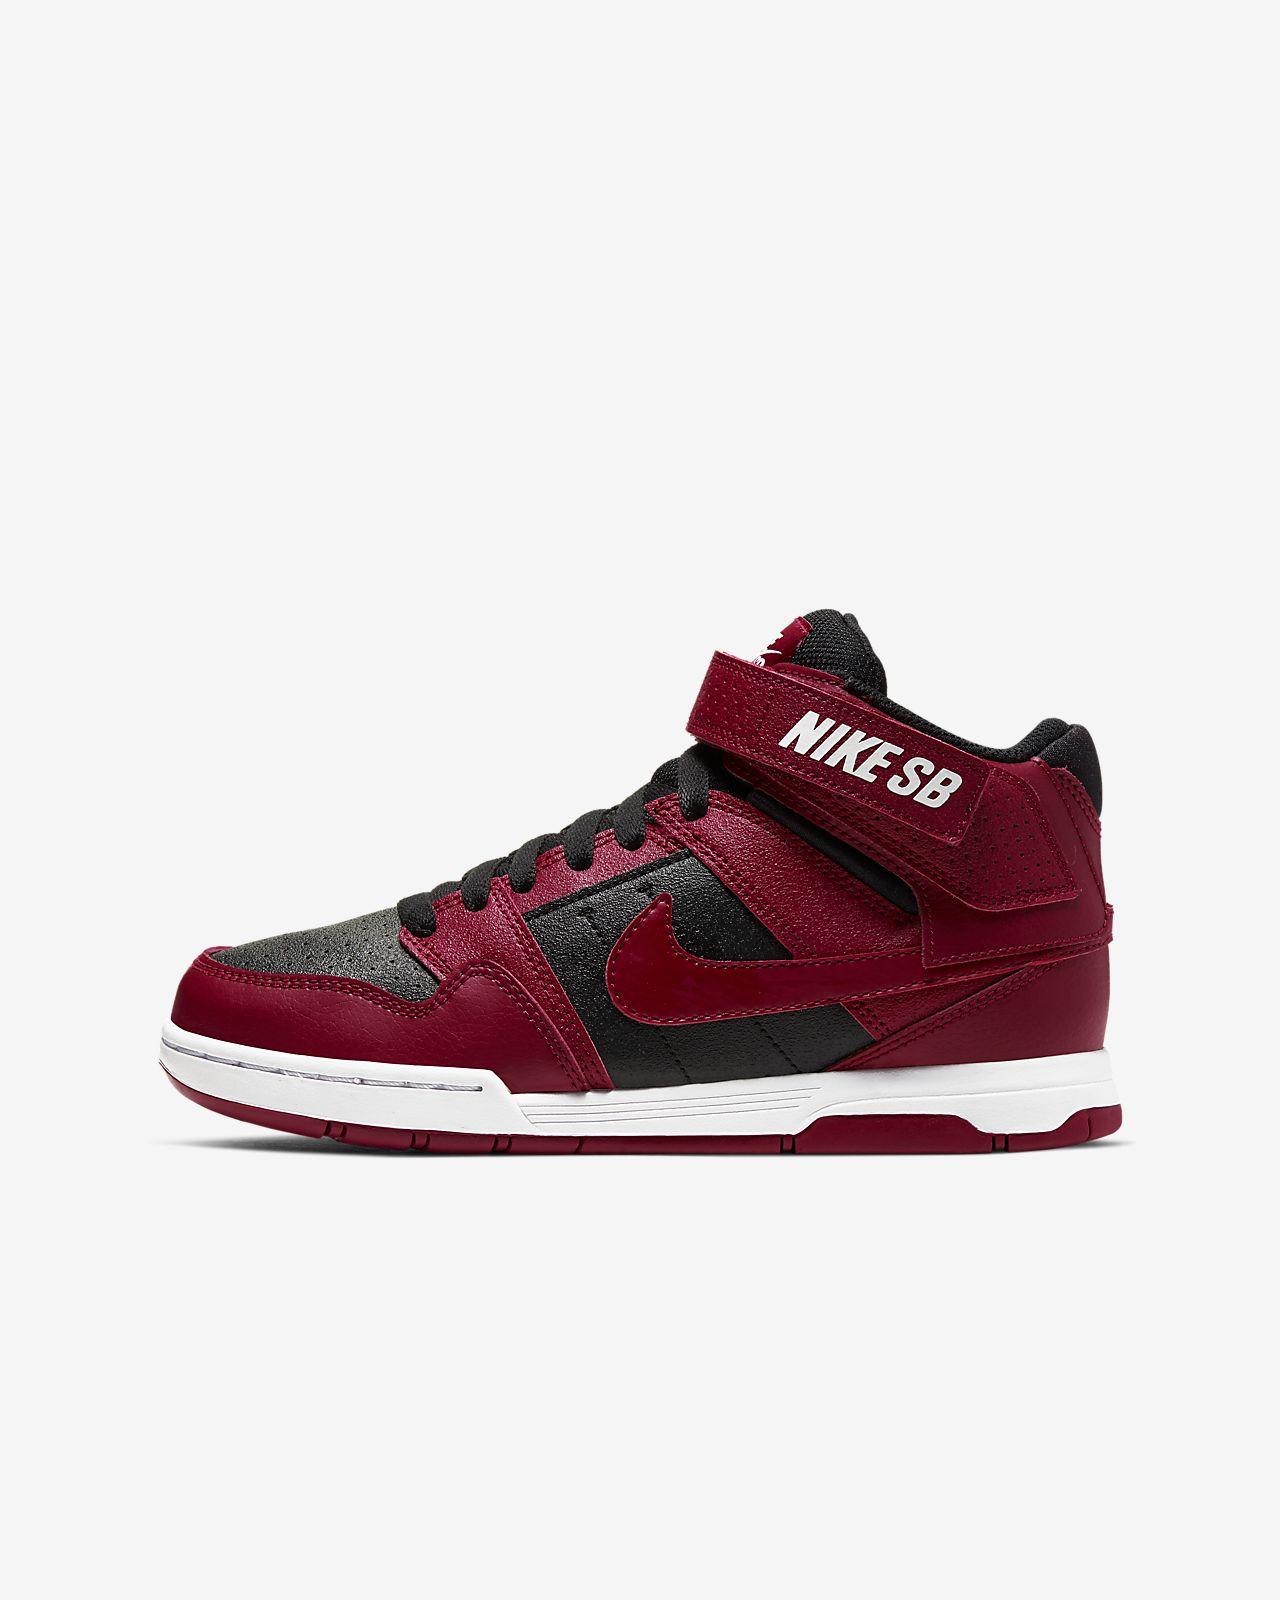 Nike SB Mogan Mid 2 JR Schuh für jüngere/ältere Kinder